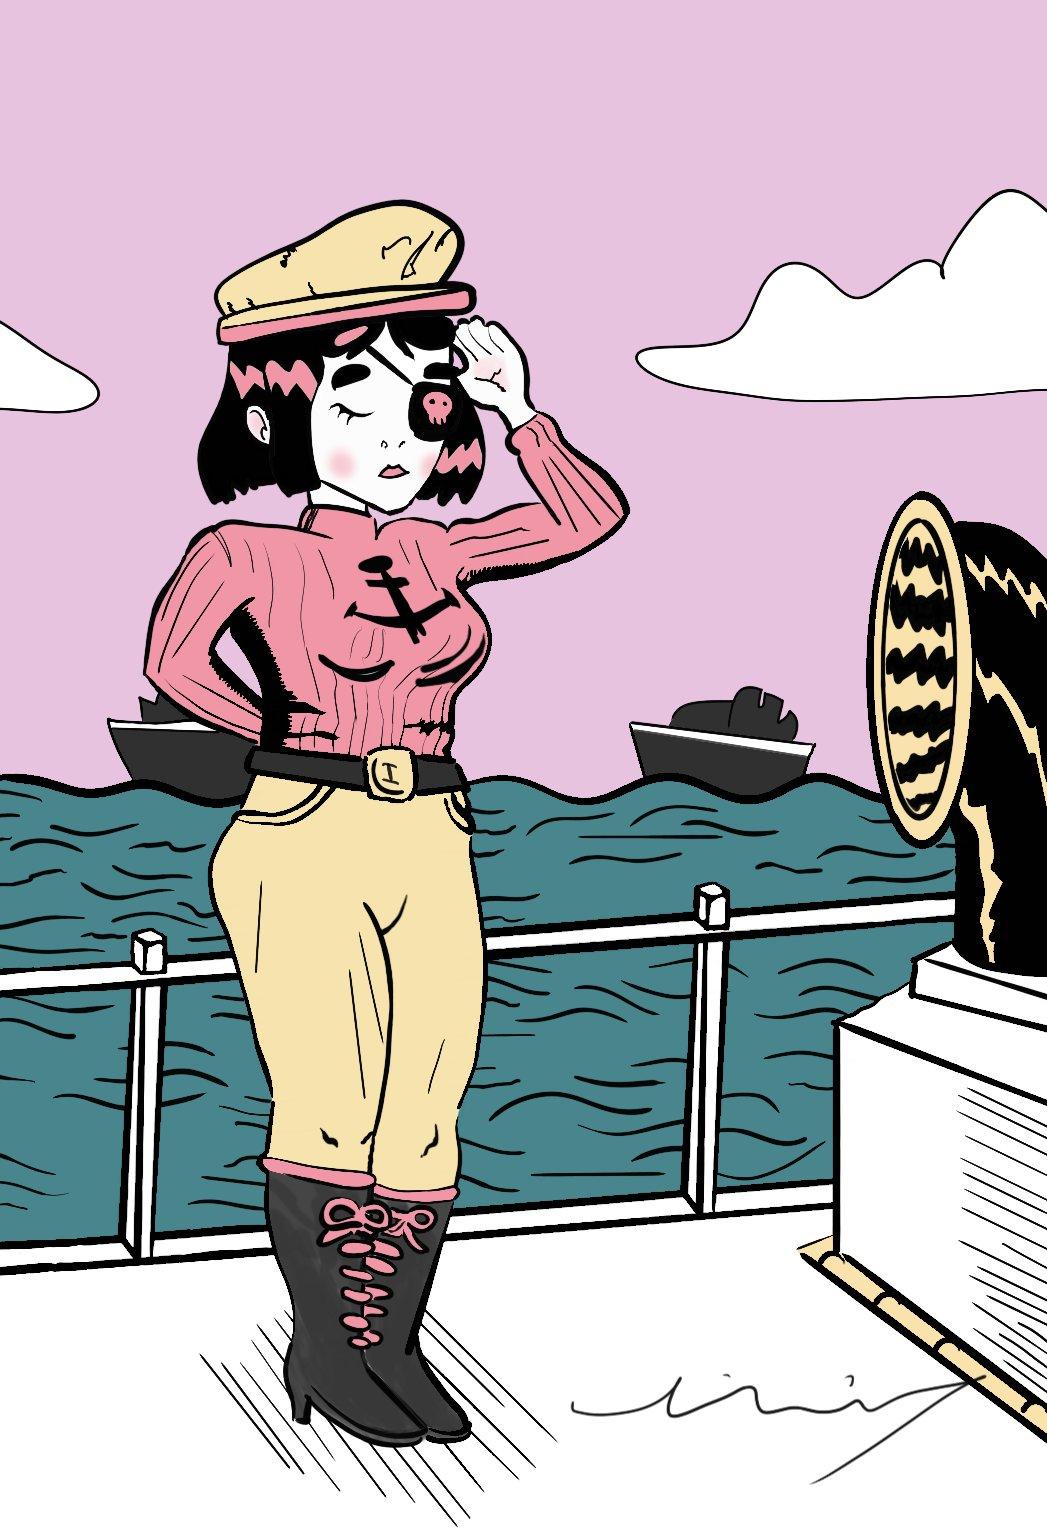 Fan art of Jasper Jubenvill's Dynamite Diva comic character on a boat at sea in navy costume